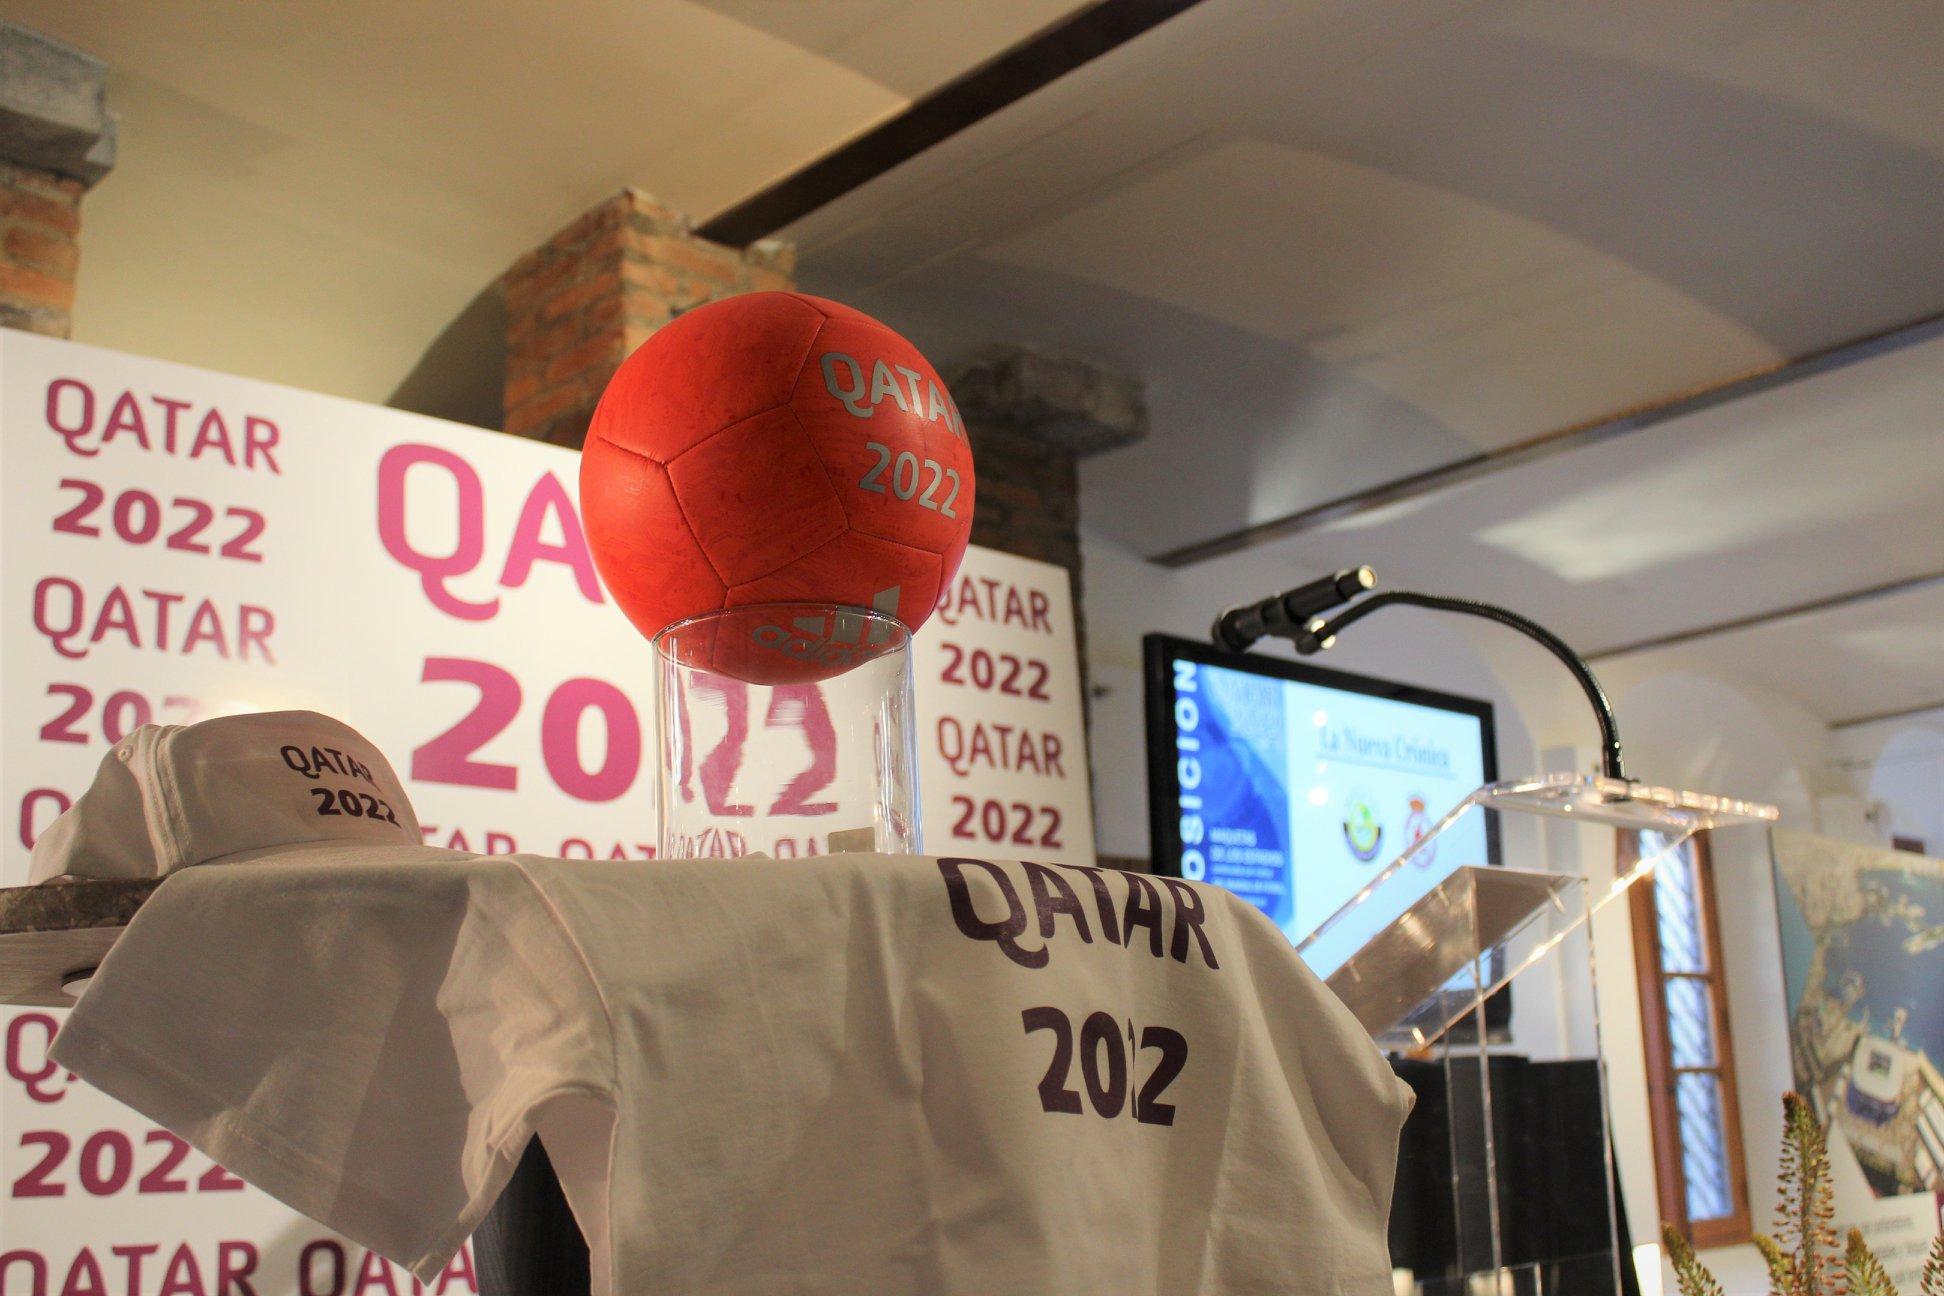 qatar 2022 botines